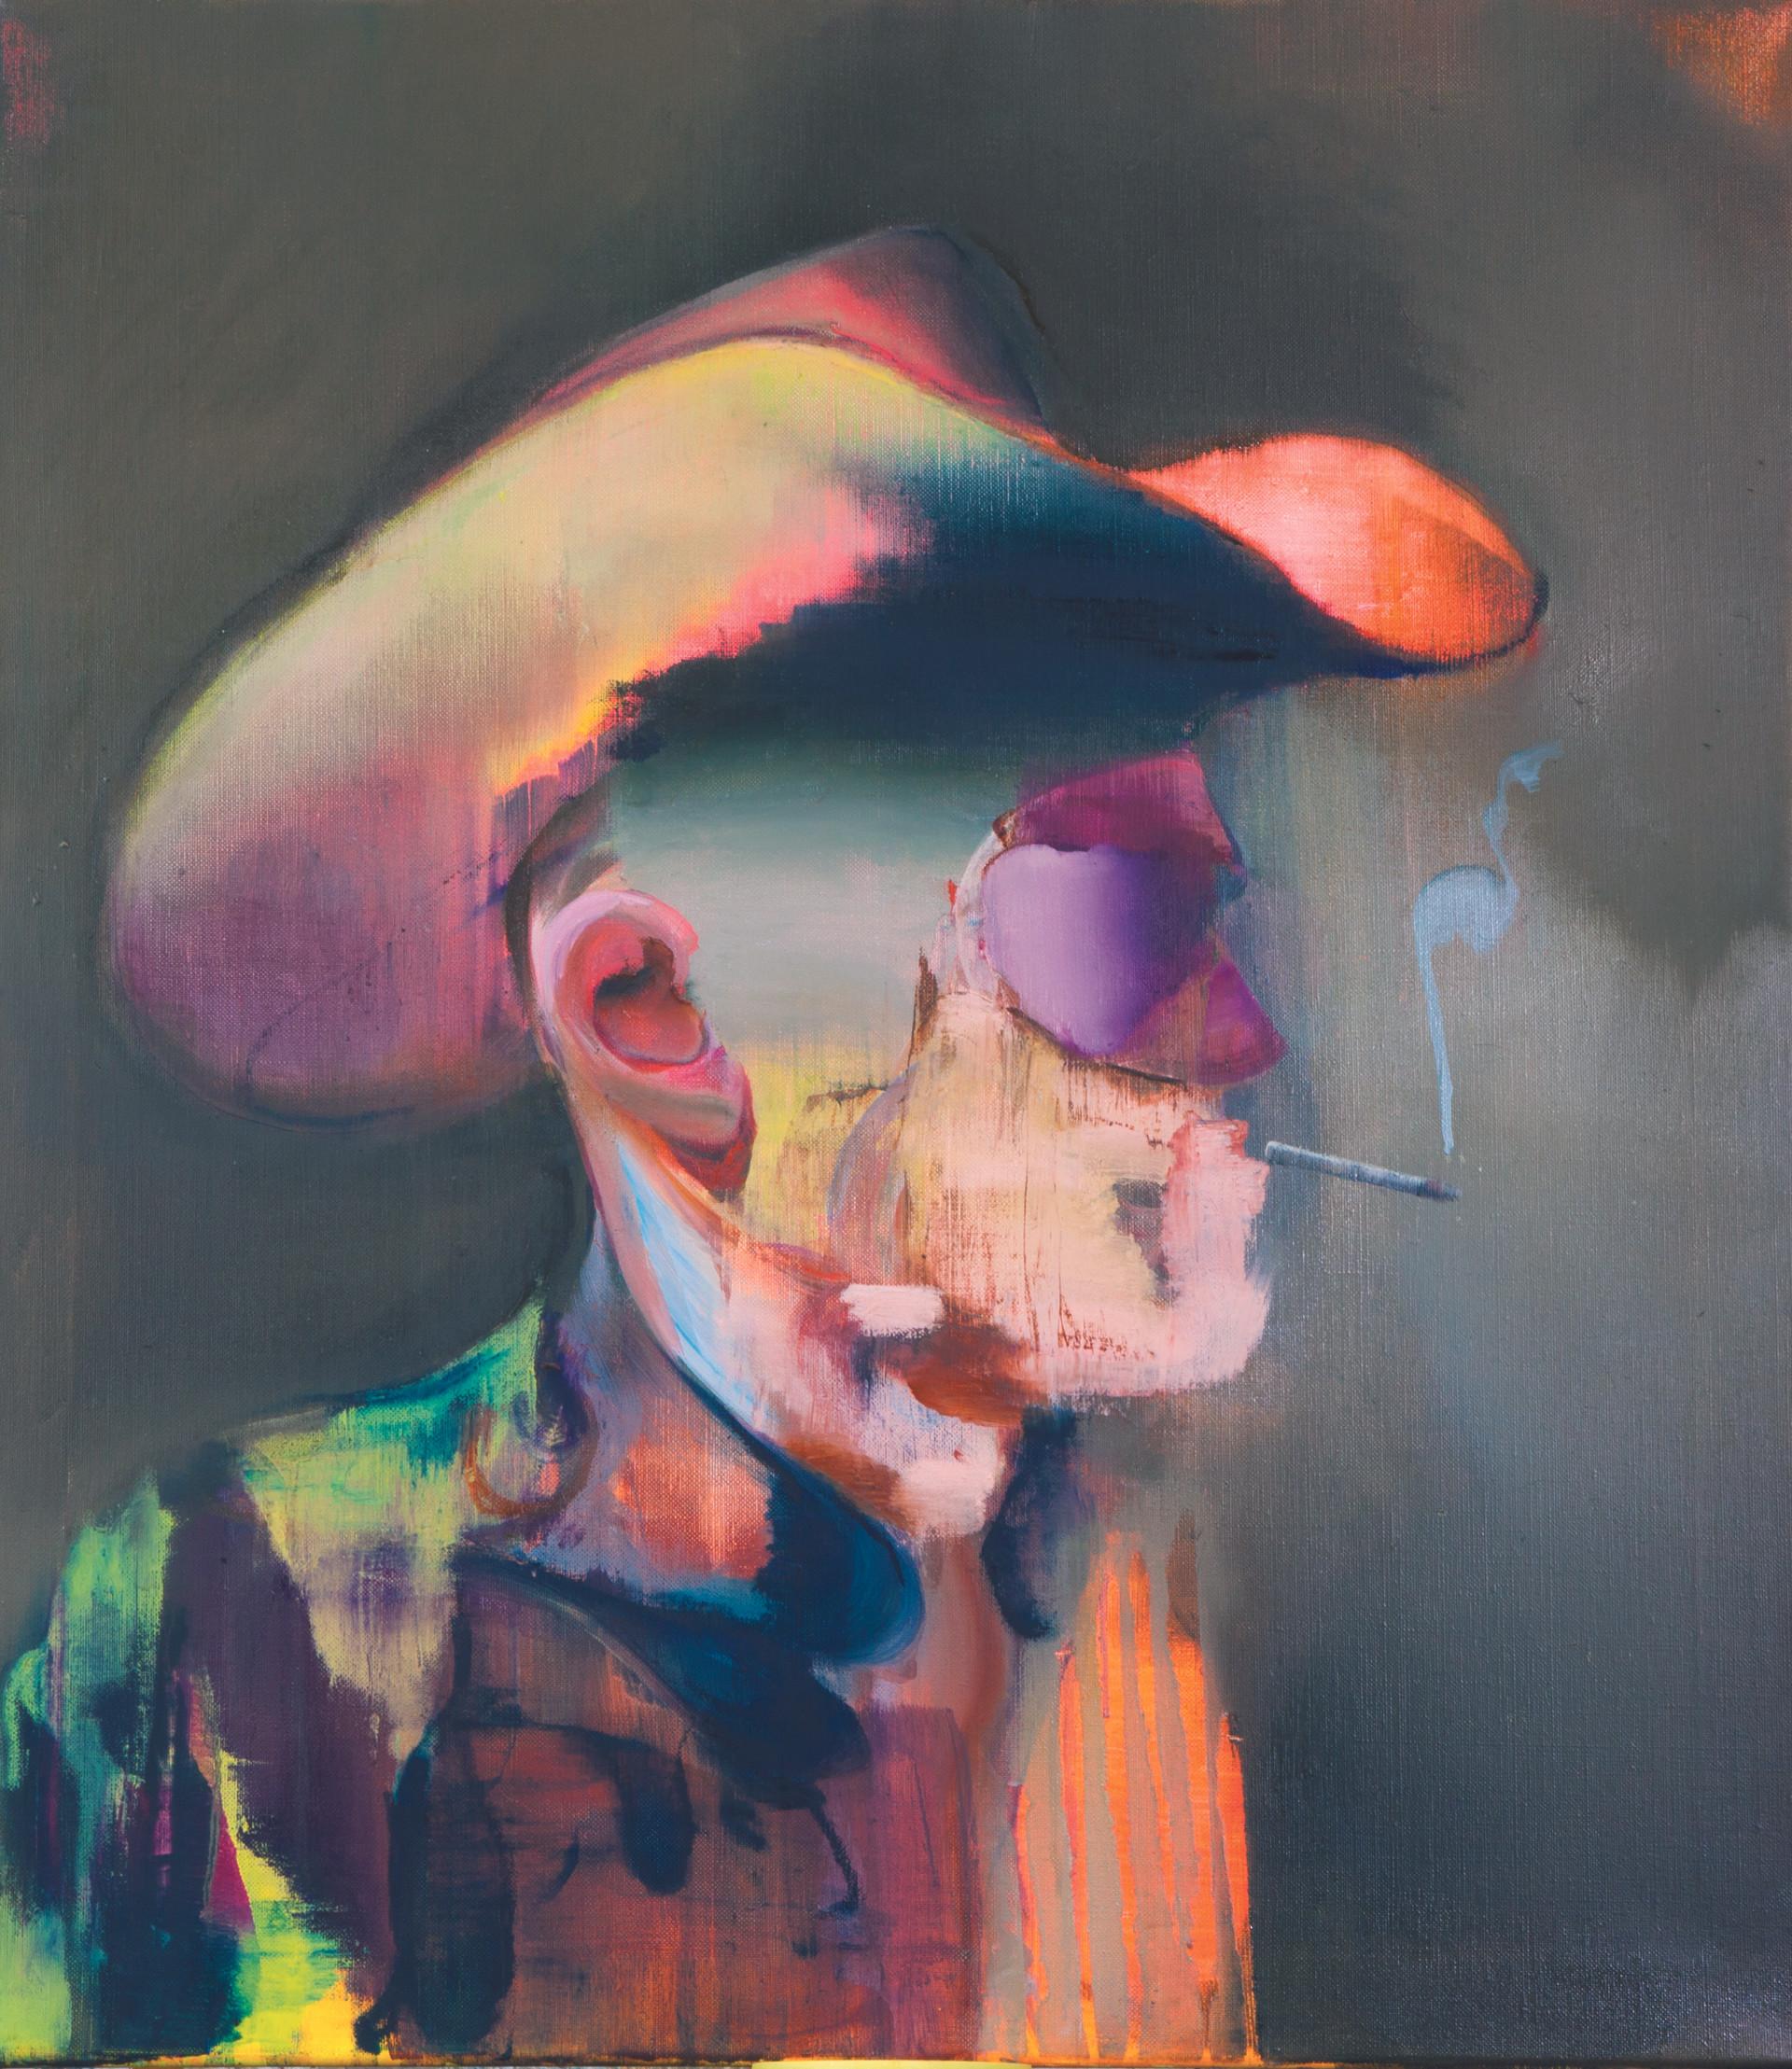 Hans-Ferdinand, 80 x 70 cm, oil on linen, 2019